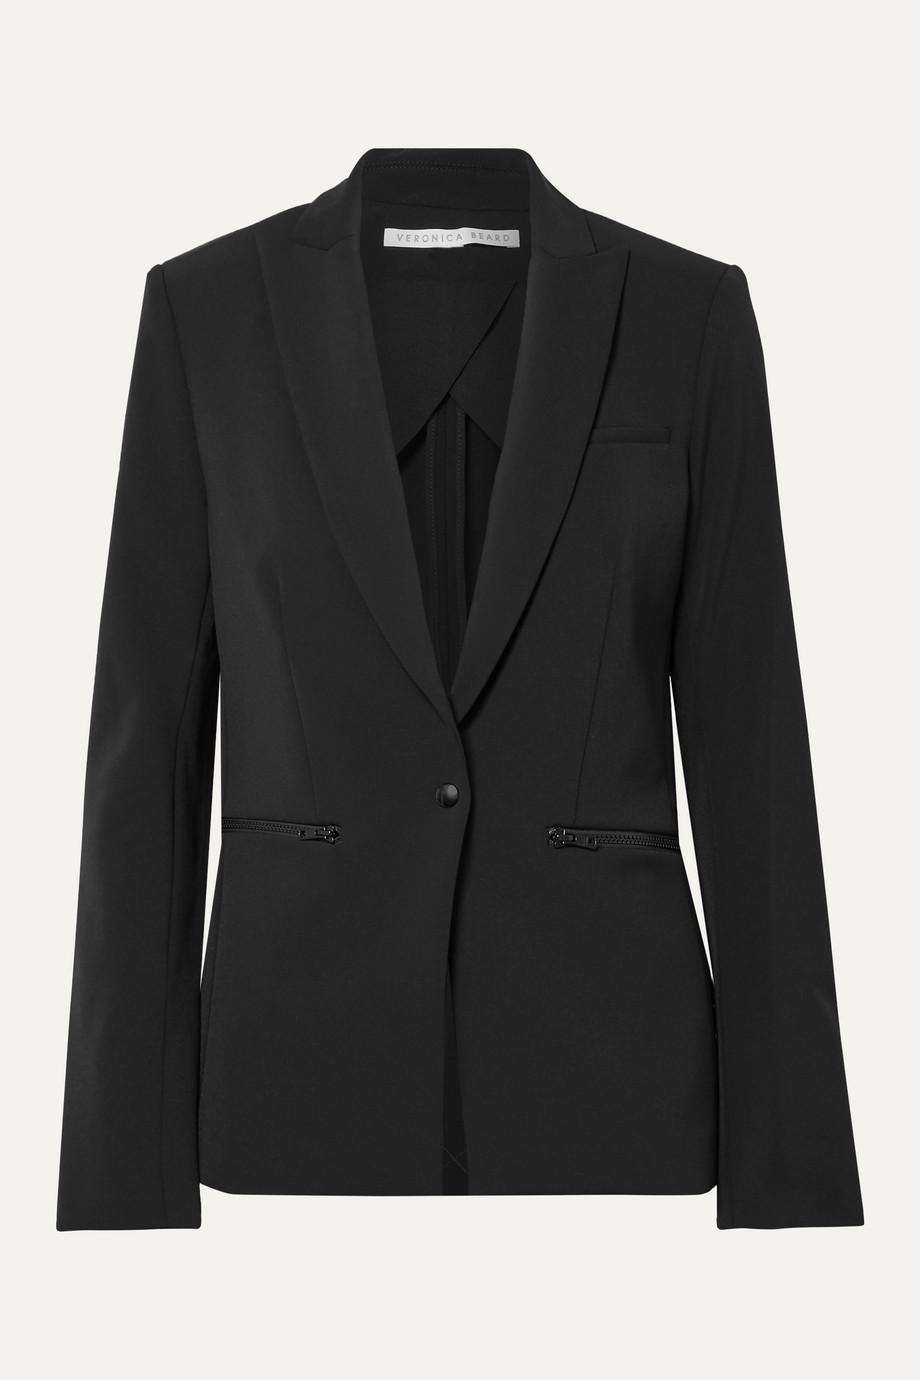 Veronica Beard 弹力绉纱西装外套